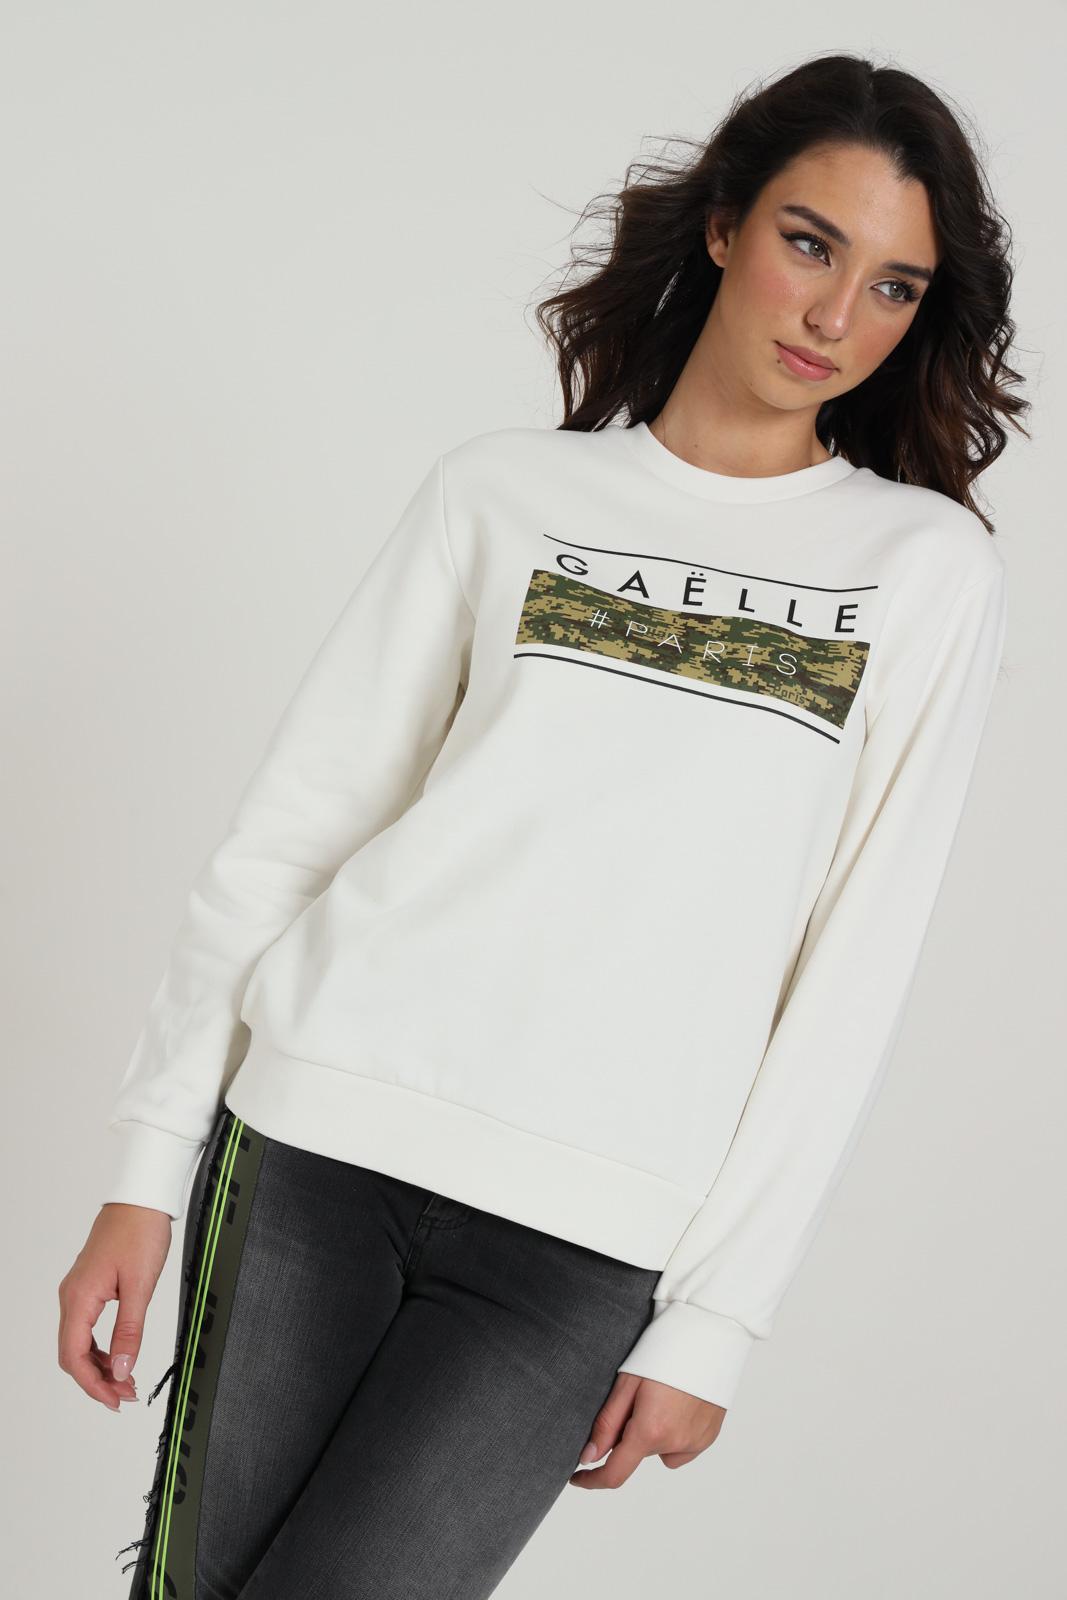 GAELLE | Sweatshirt | GBD70480FF WHITE